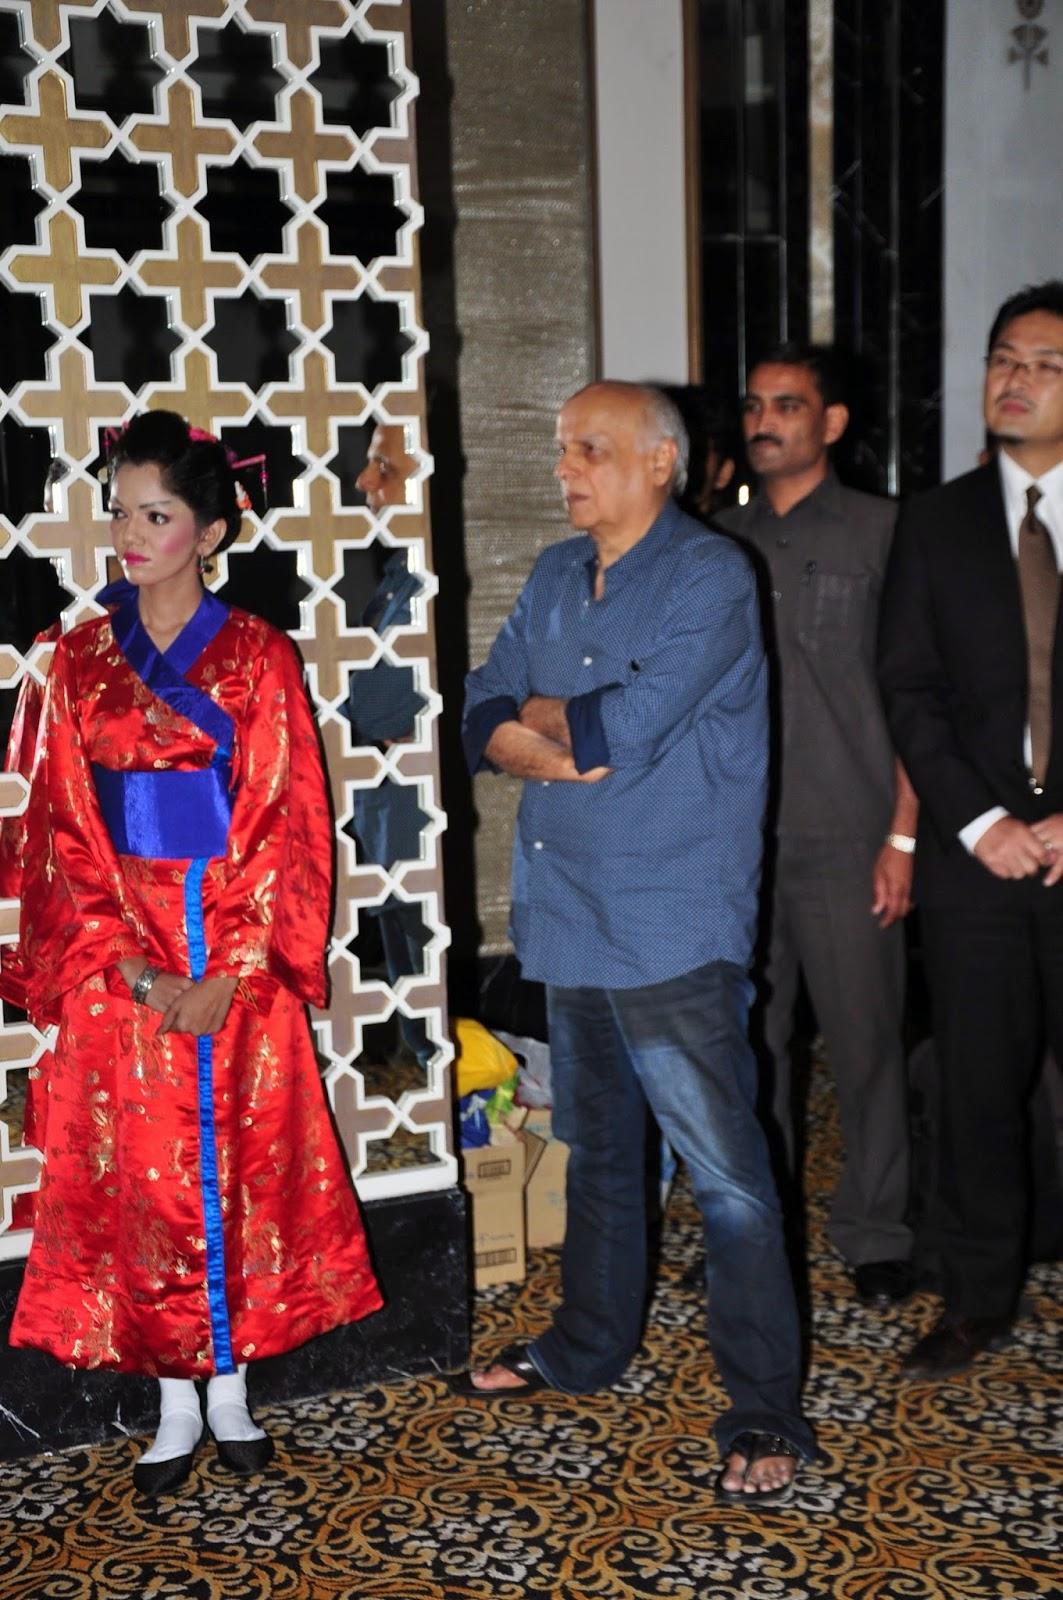 Mahesh Bhatt at 'Japan Film Festival 2014' announcement